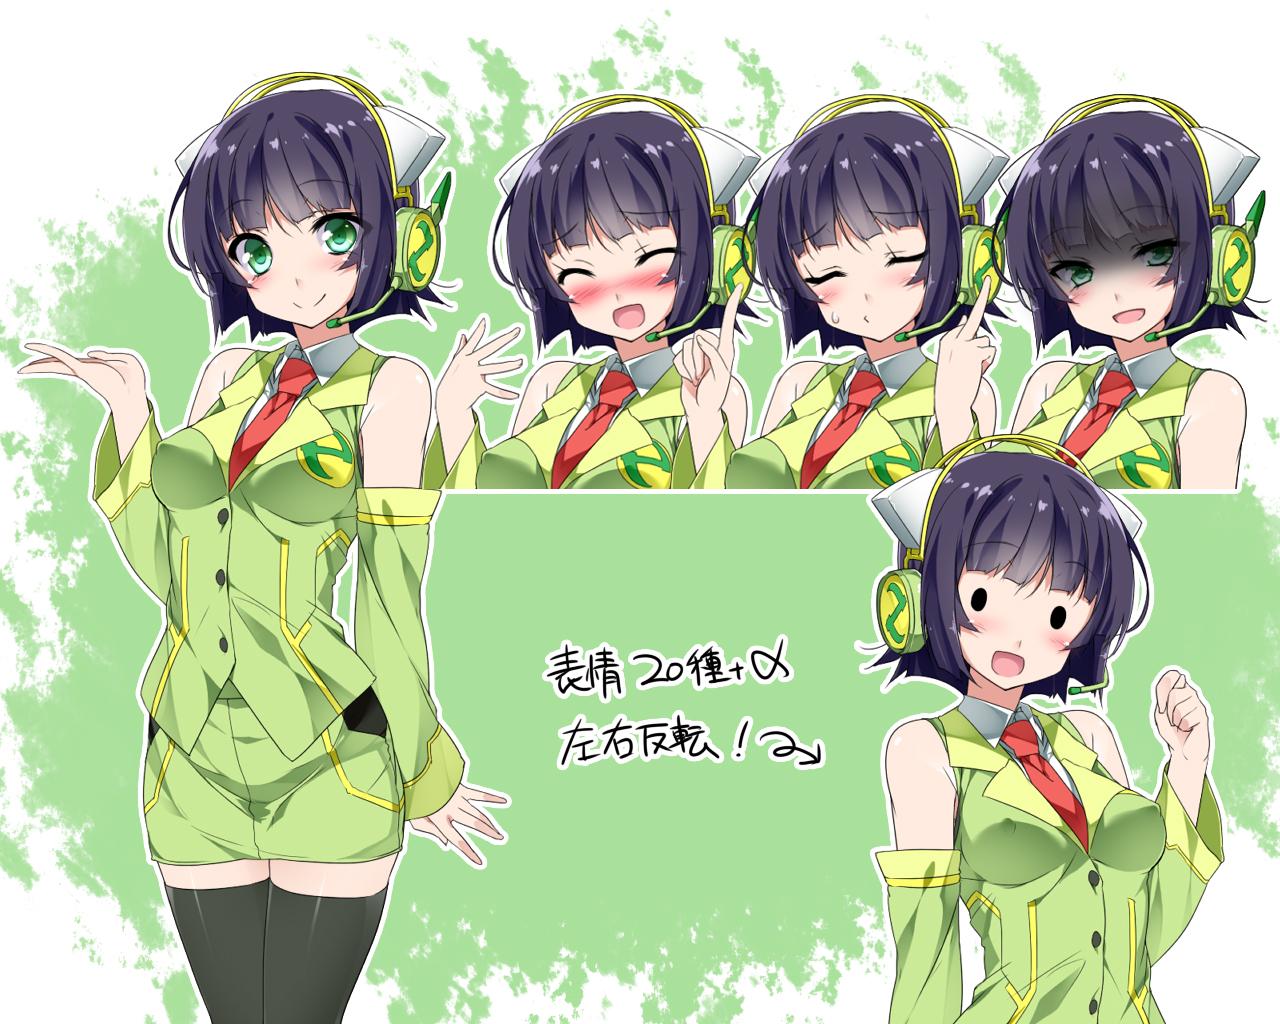 black_hair blush erect_nipples green green_eyes headphones kyoumachi_seika microphone mtu short_hair skirt suit thighhighs tie translation_request voiceroid zettai_ryouiki